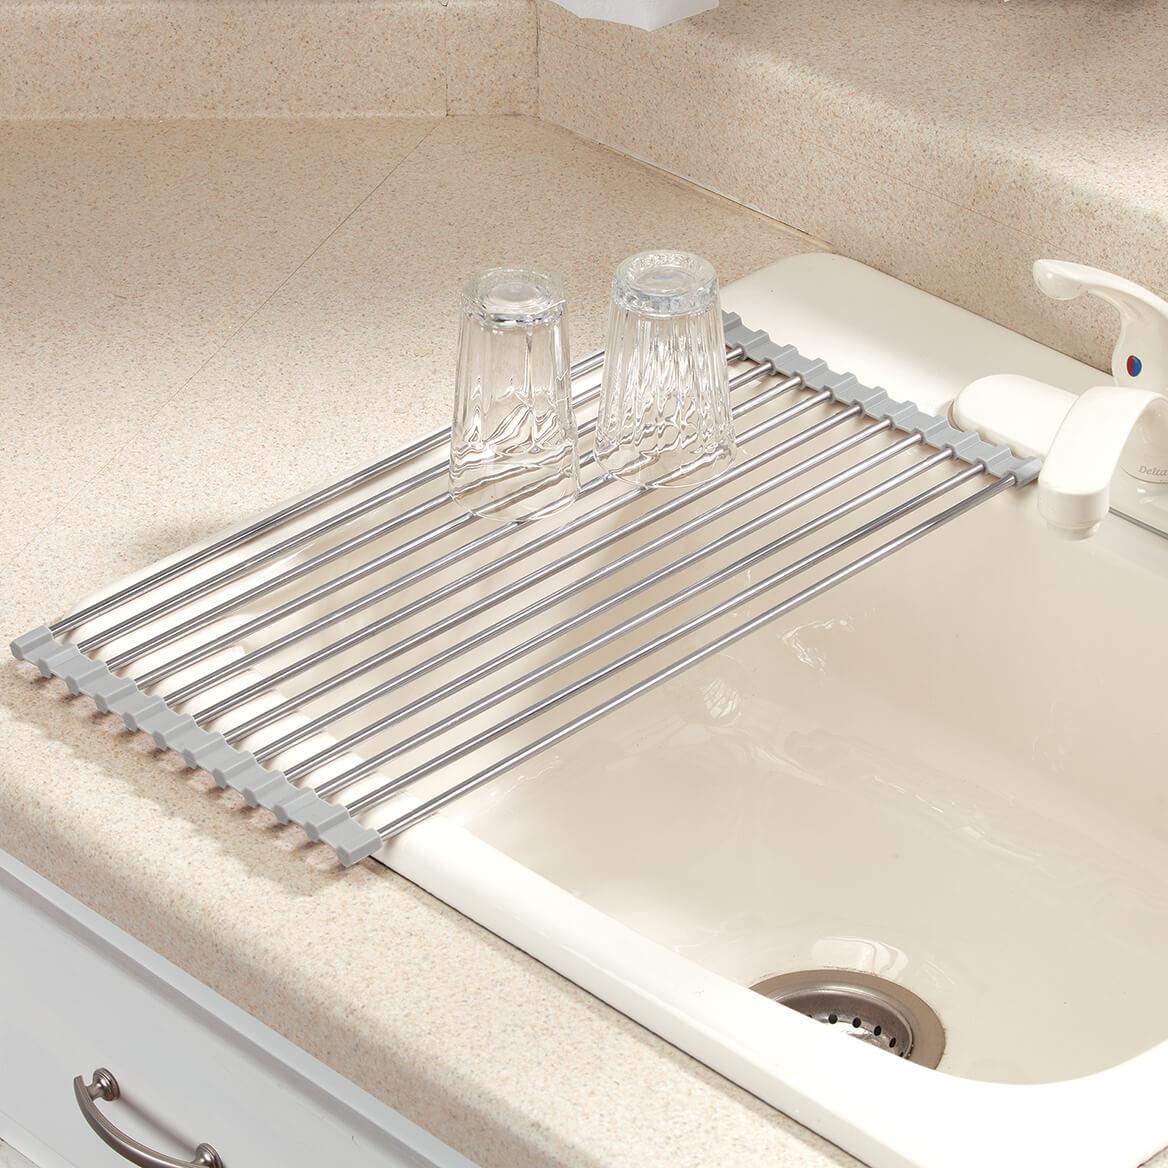 Roll-up Sink Drying Mat-371381